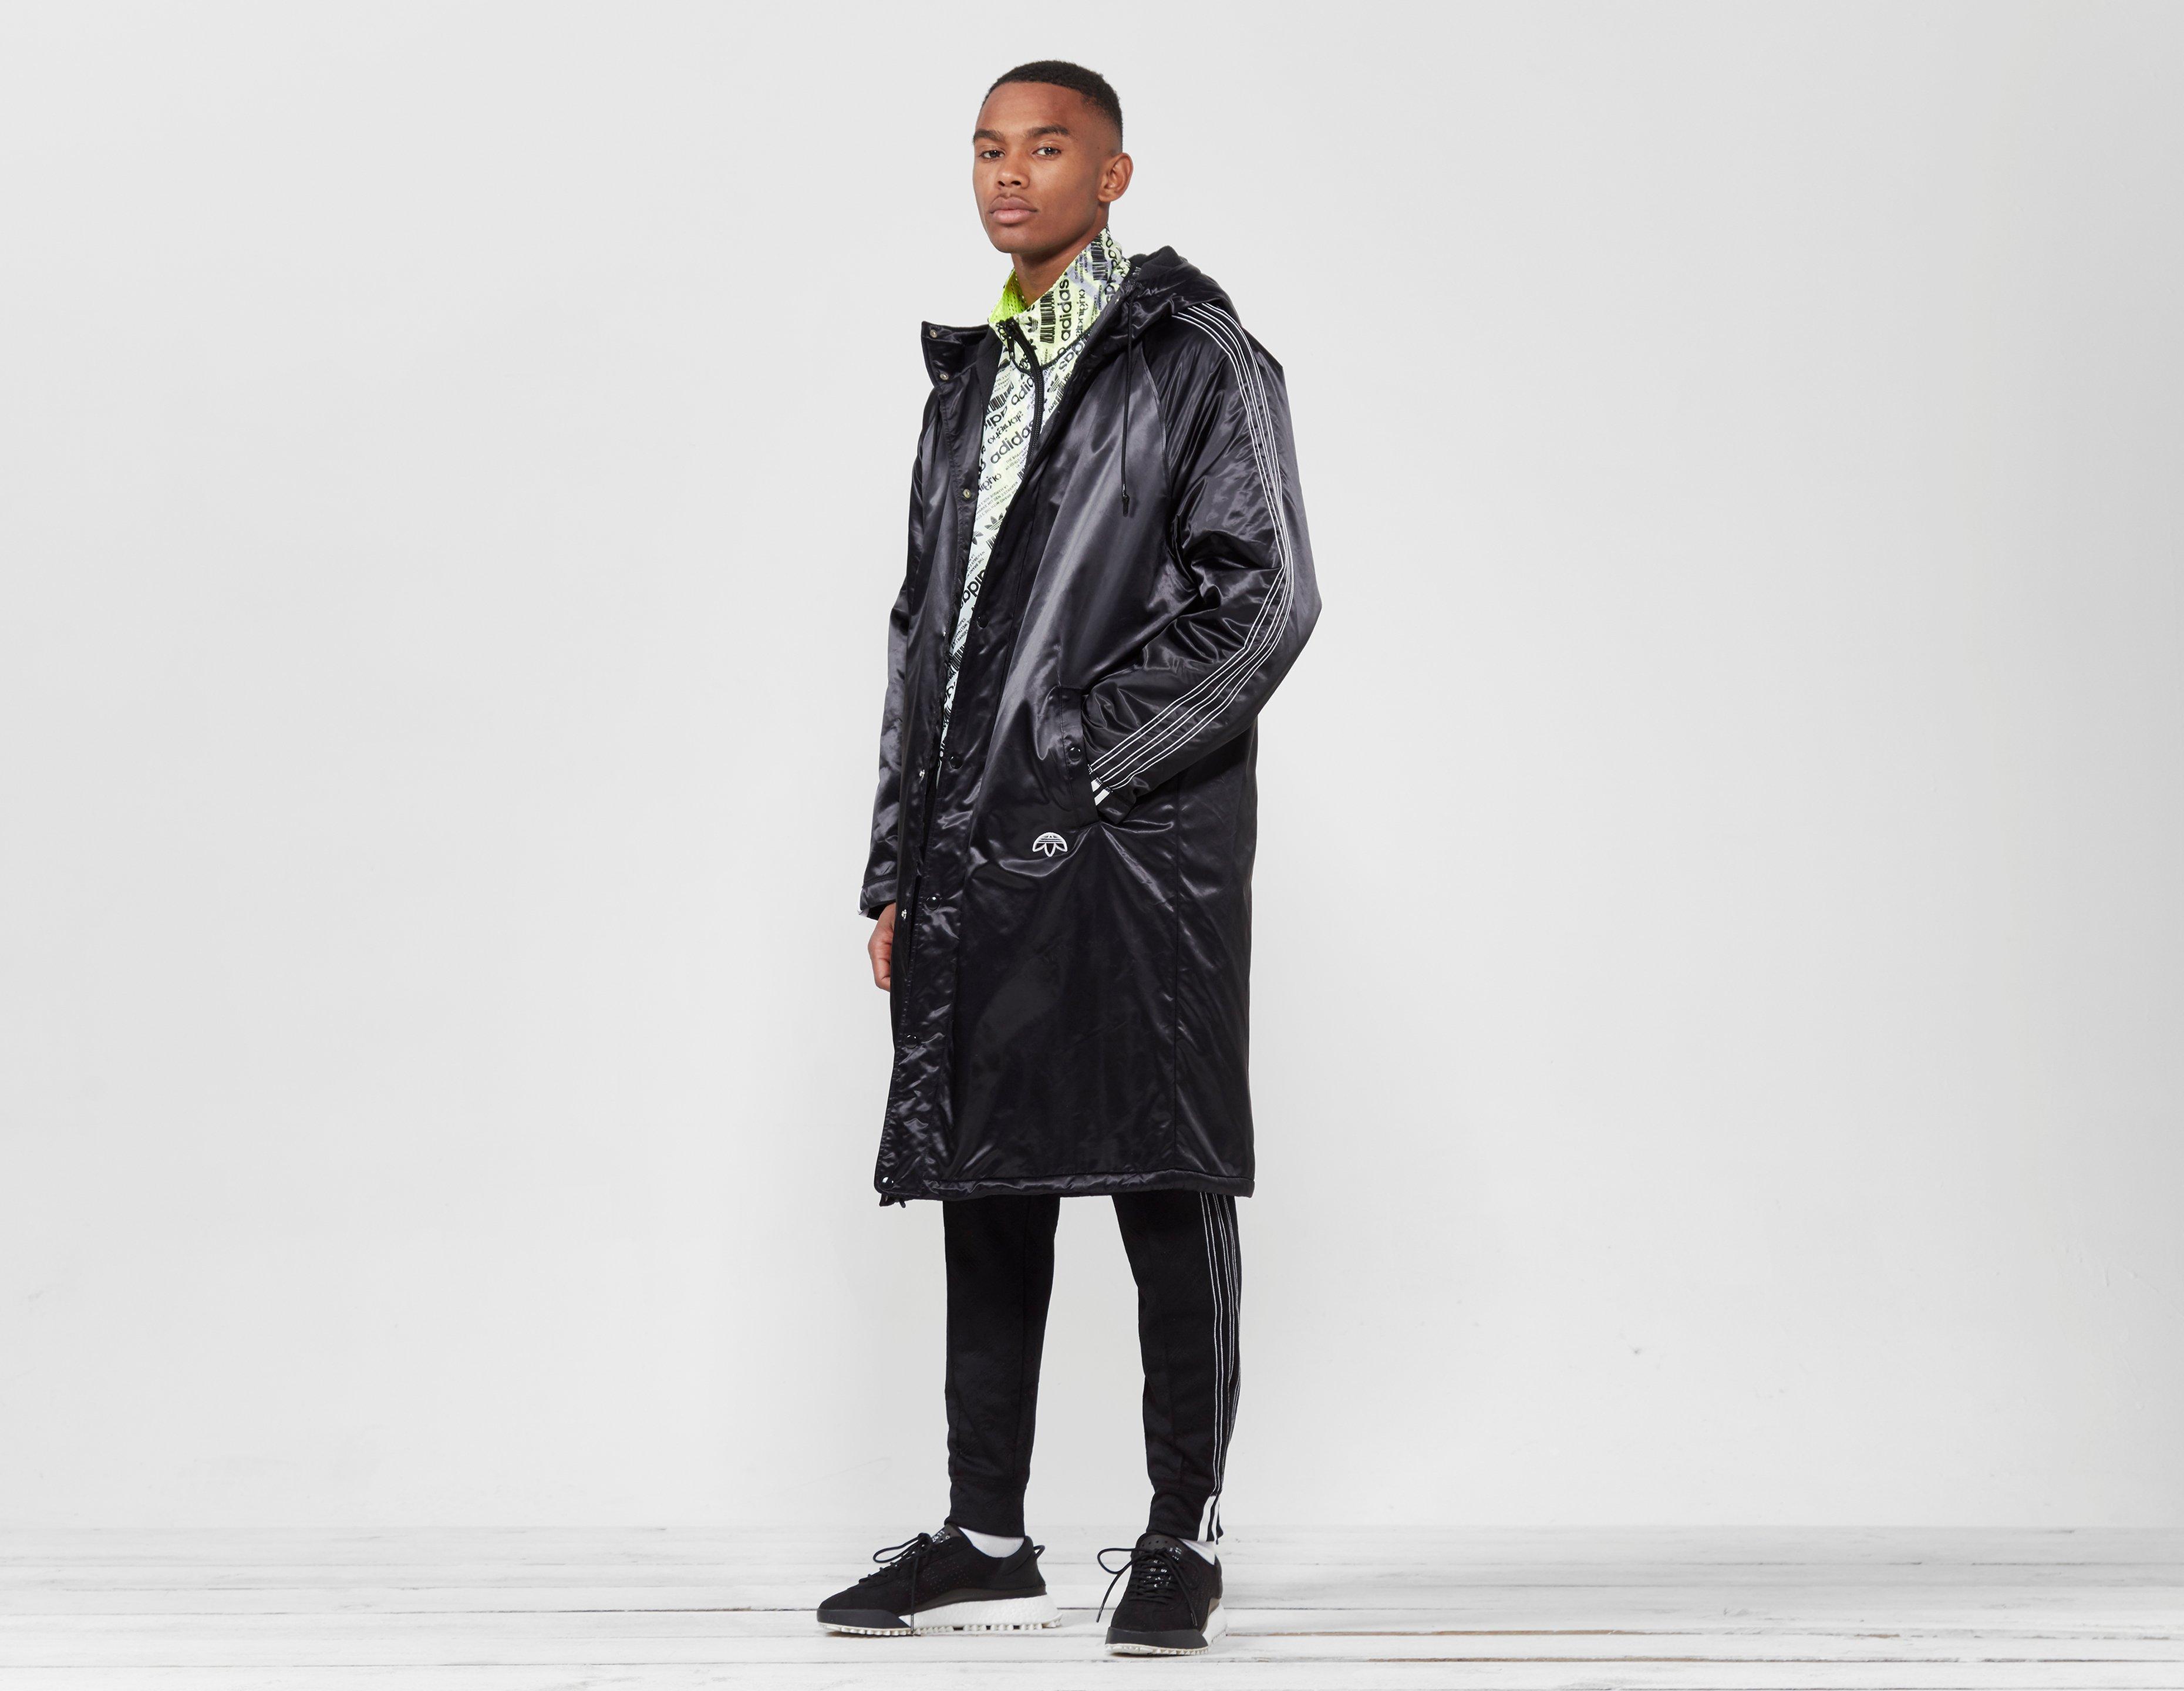 88b1d983b329 Lyst - Adidas Originals By Alexander Wang Stadium Jacket in Black ...